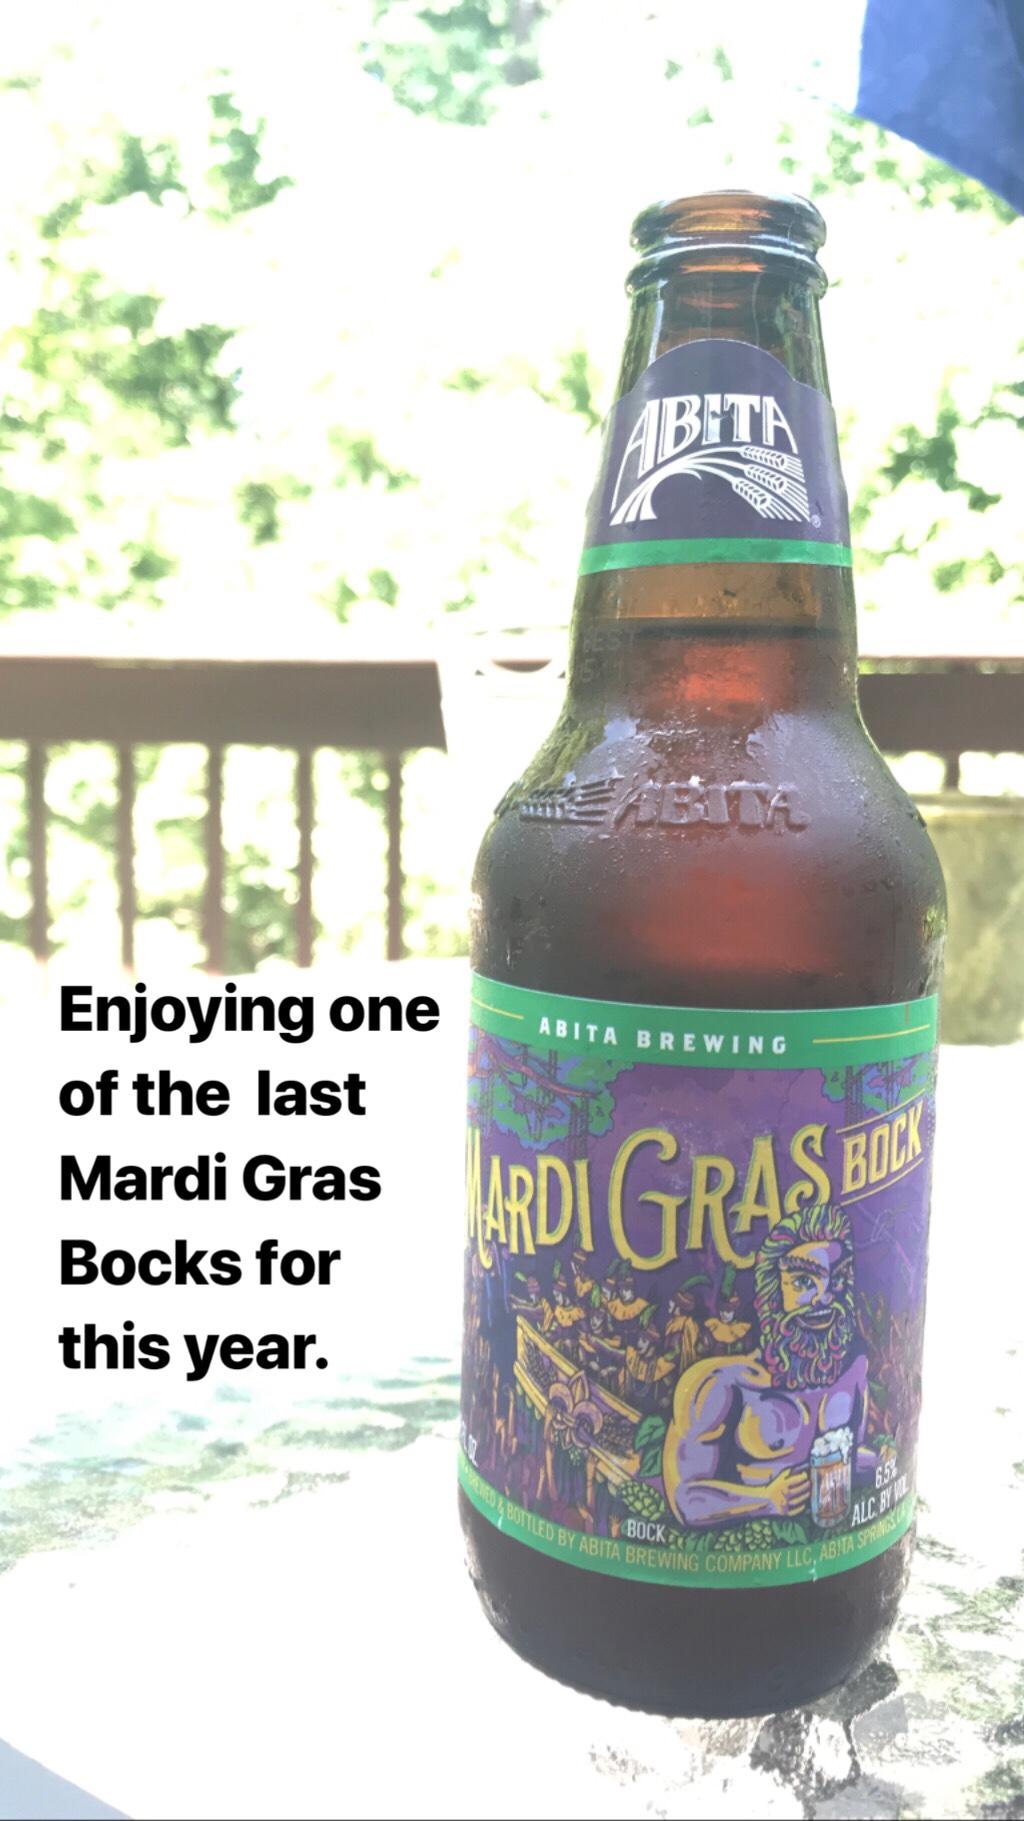 Mardi Gras Bock beer